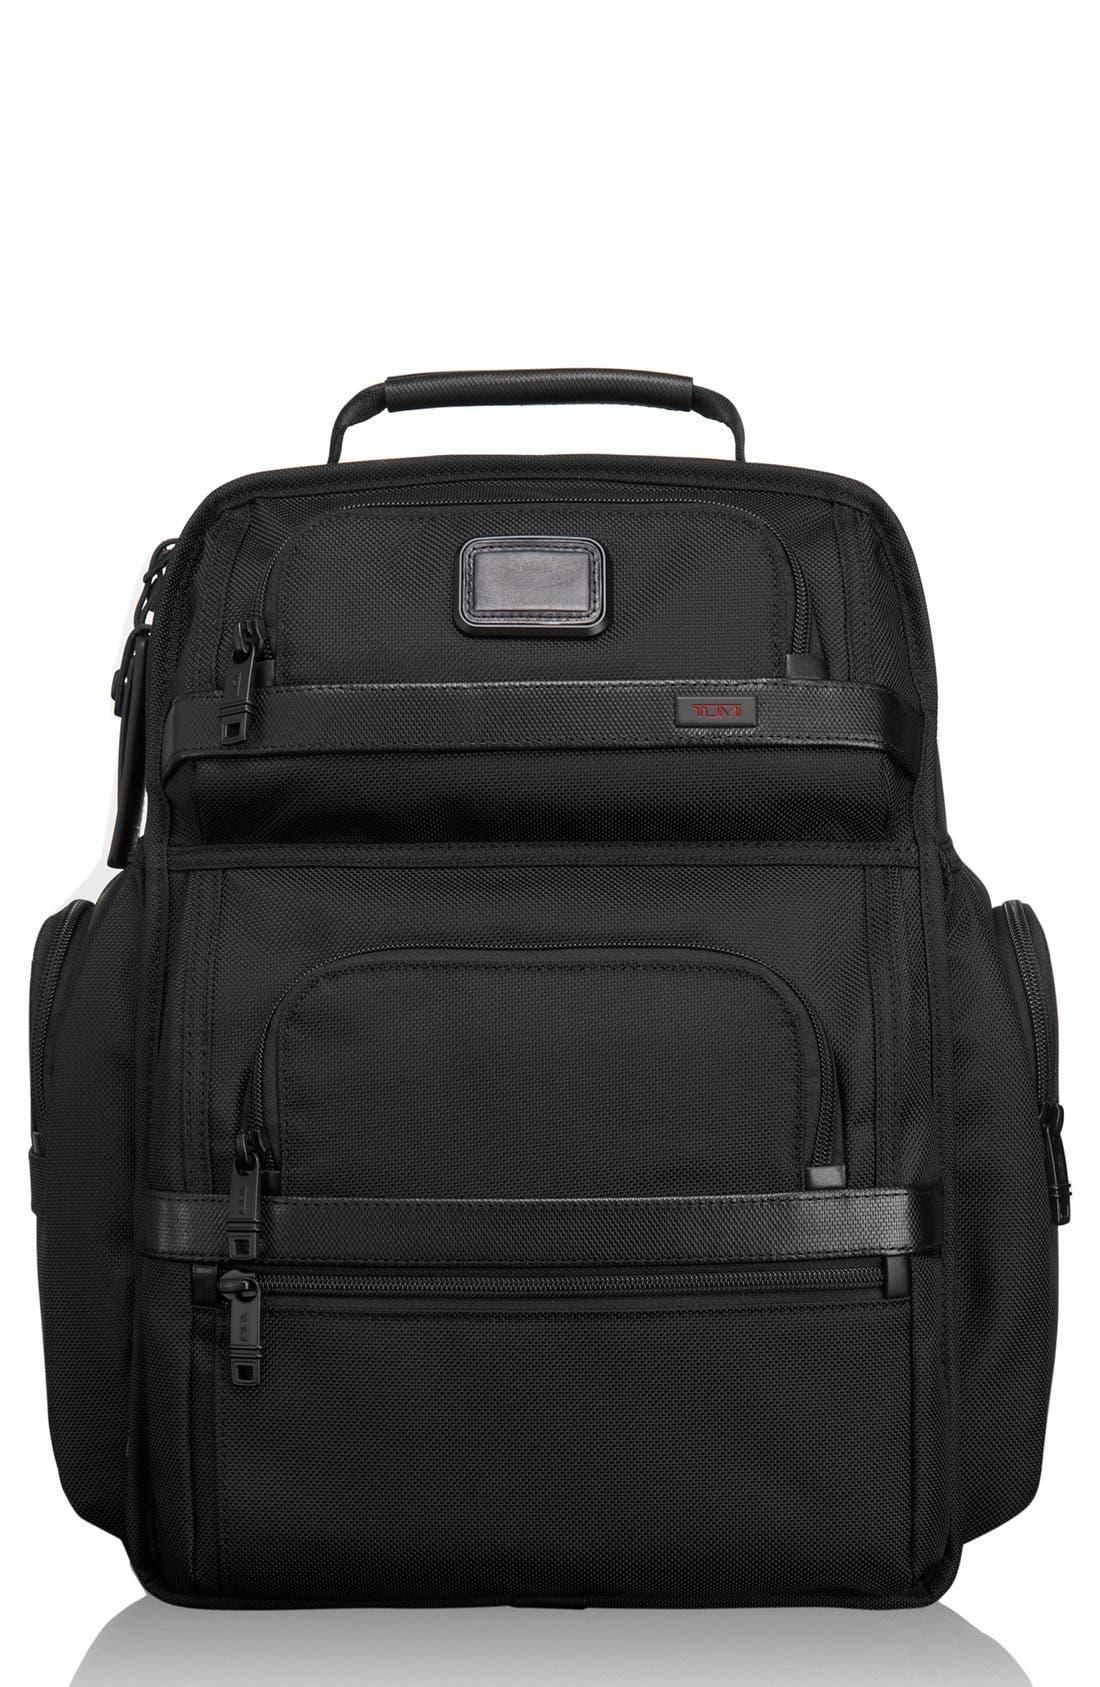 Tumi 'Alpha 2' T-Pass Laptop Brief Pack with Tumi ID Lock Pocket